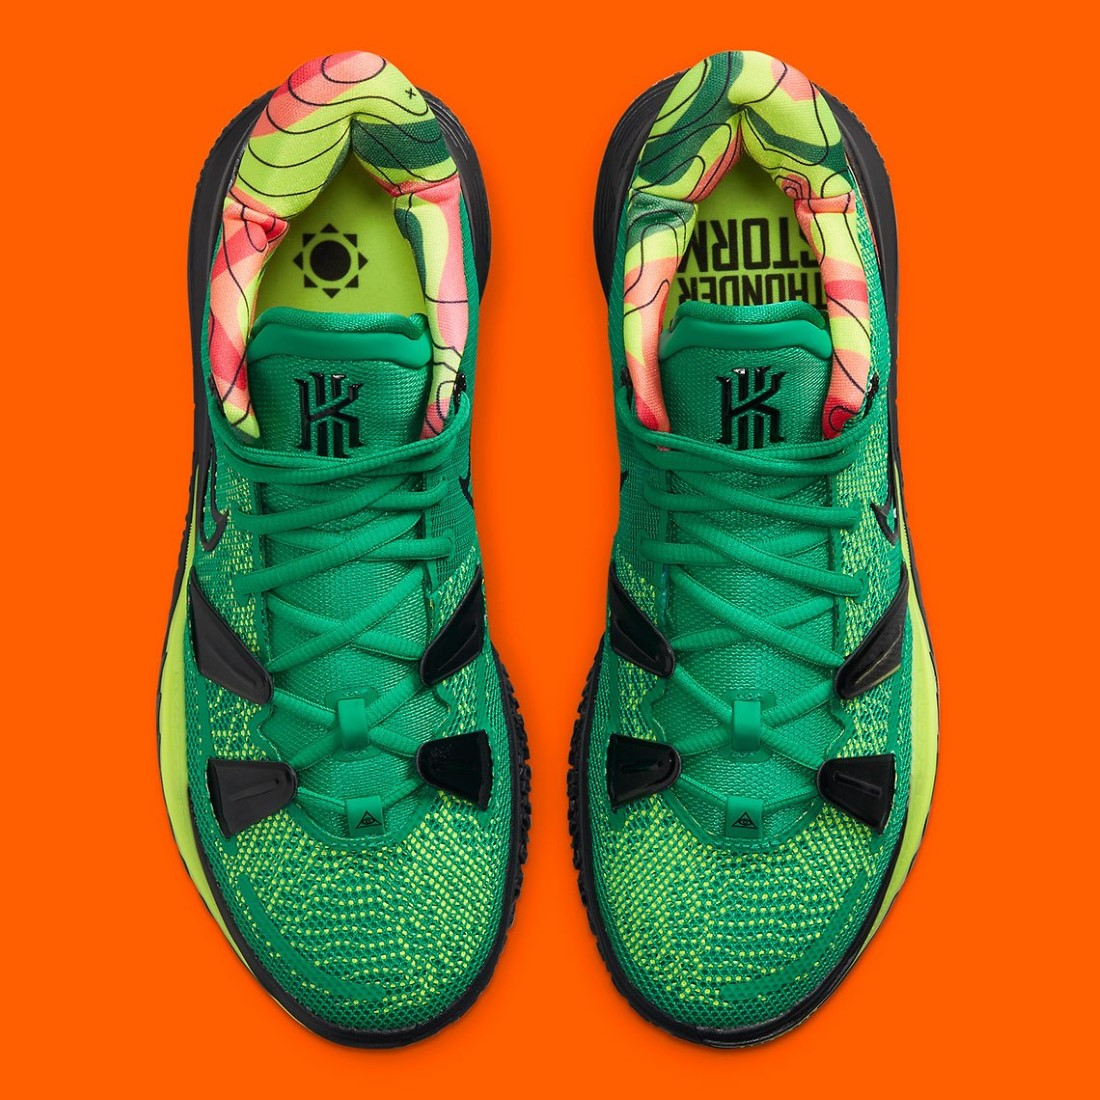 Kyrie Irving x Nike Kyrie 7 Weatherman